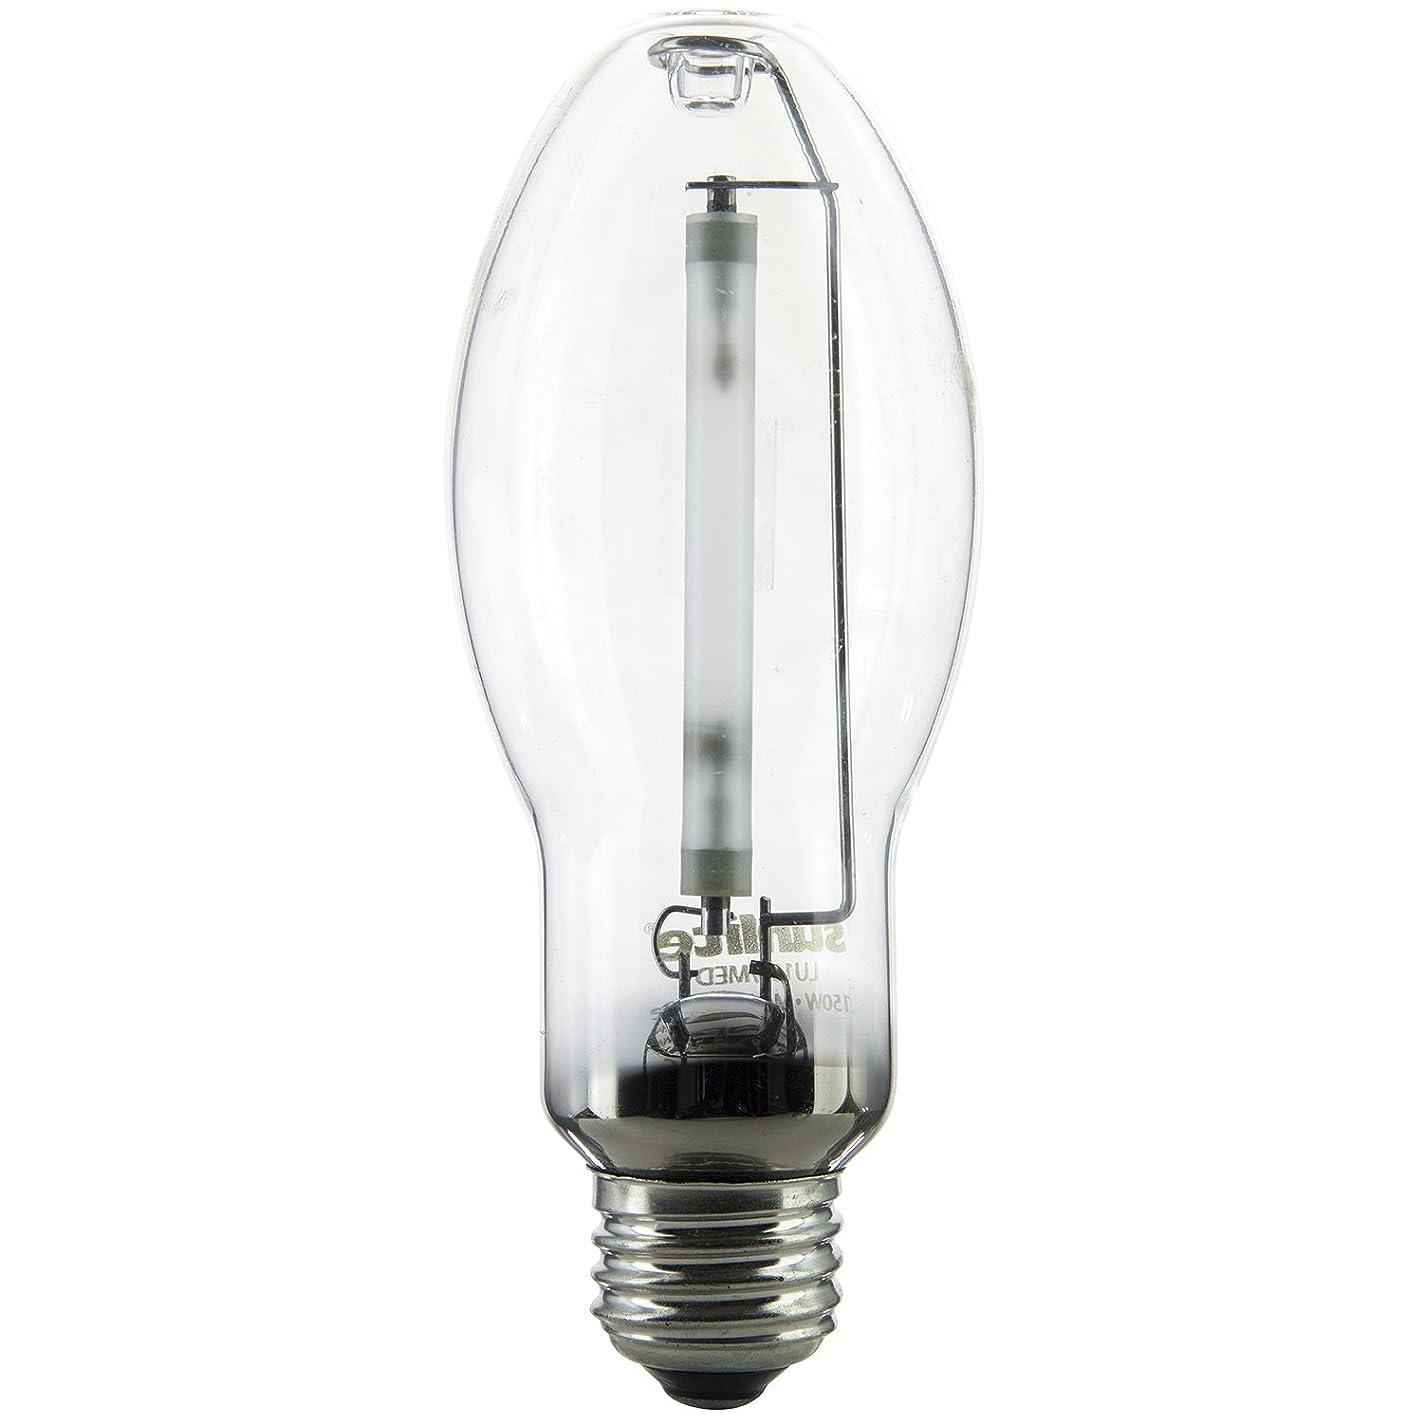 Sunlite 03620-SU LU150/MED 150 Watt HPS ED17 High Pressure Sodium Light Bulb, Medium Base, Clear